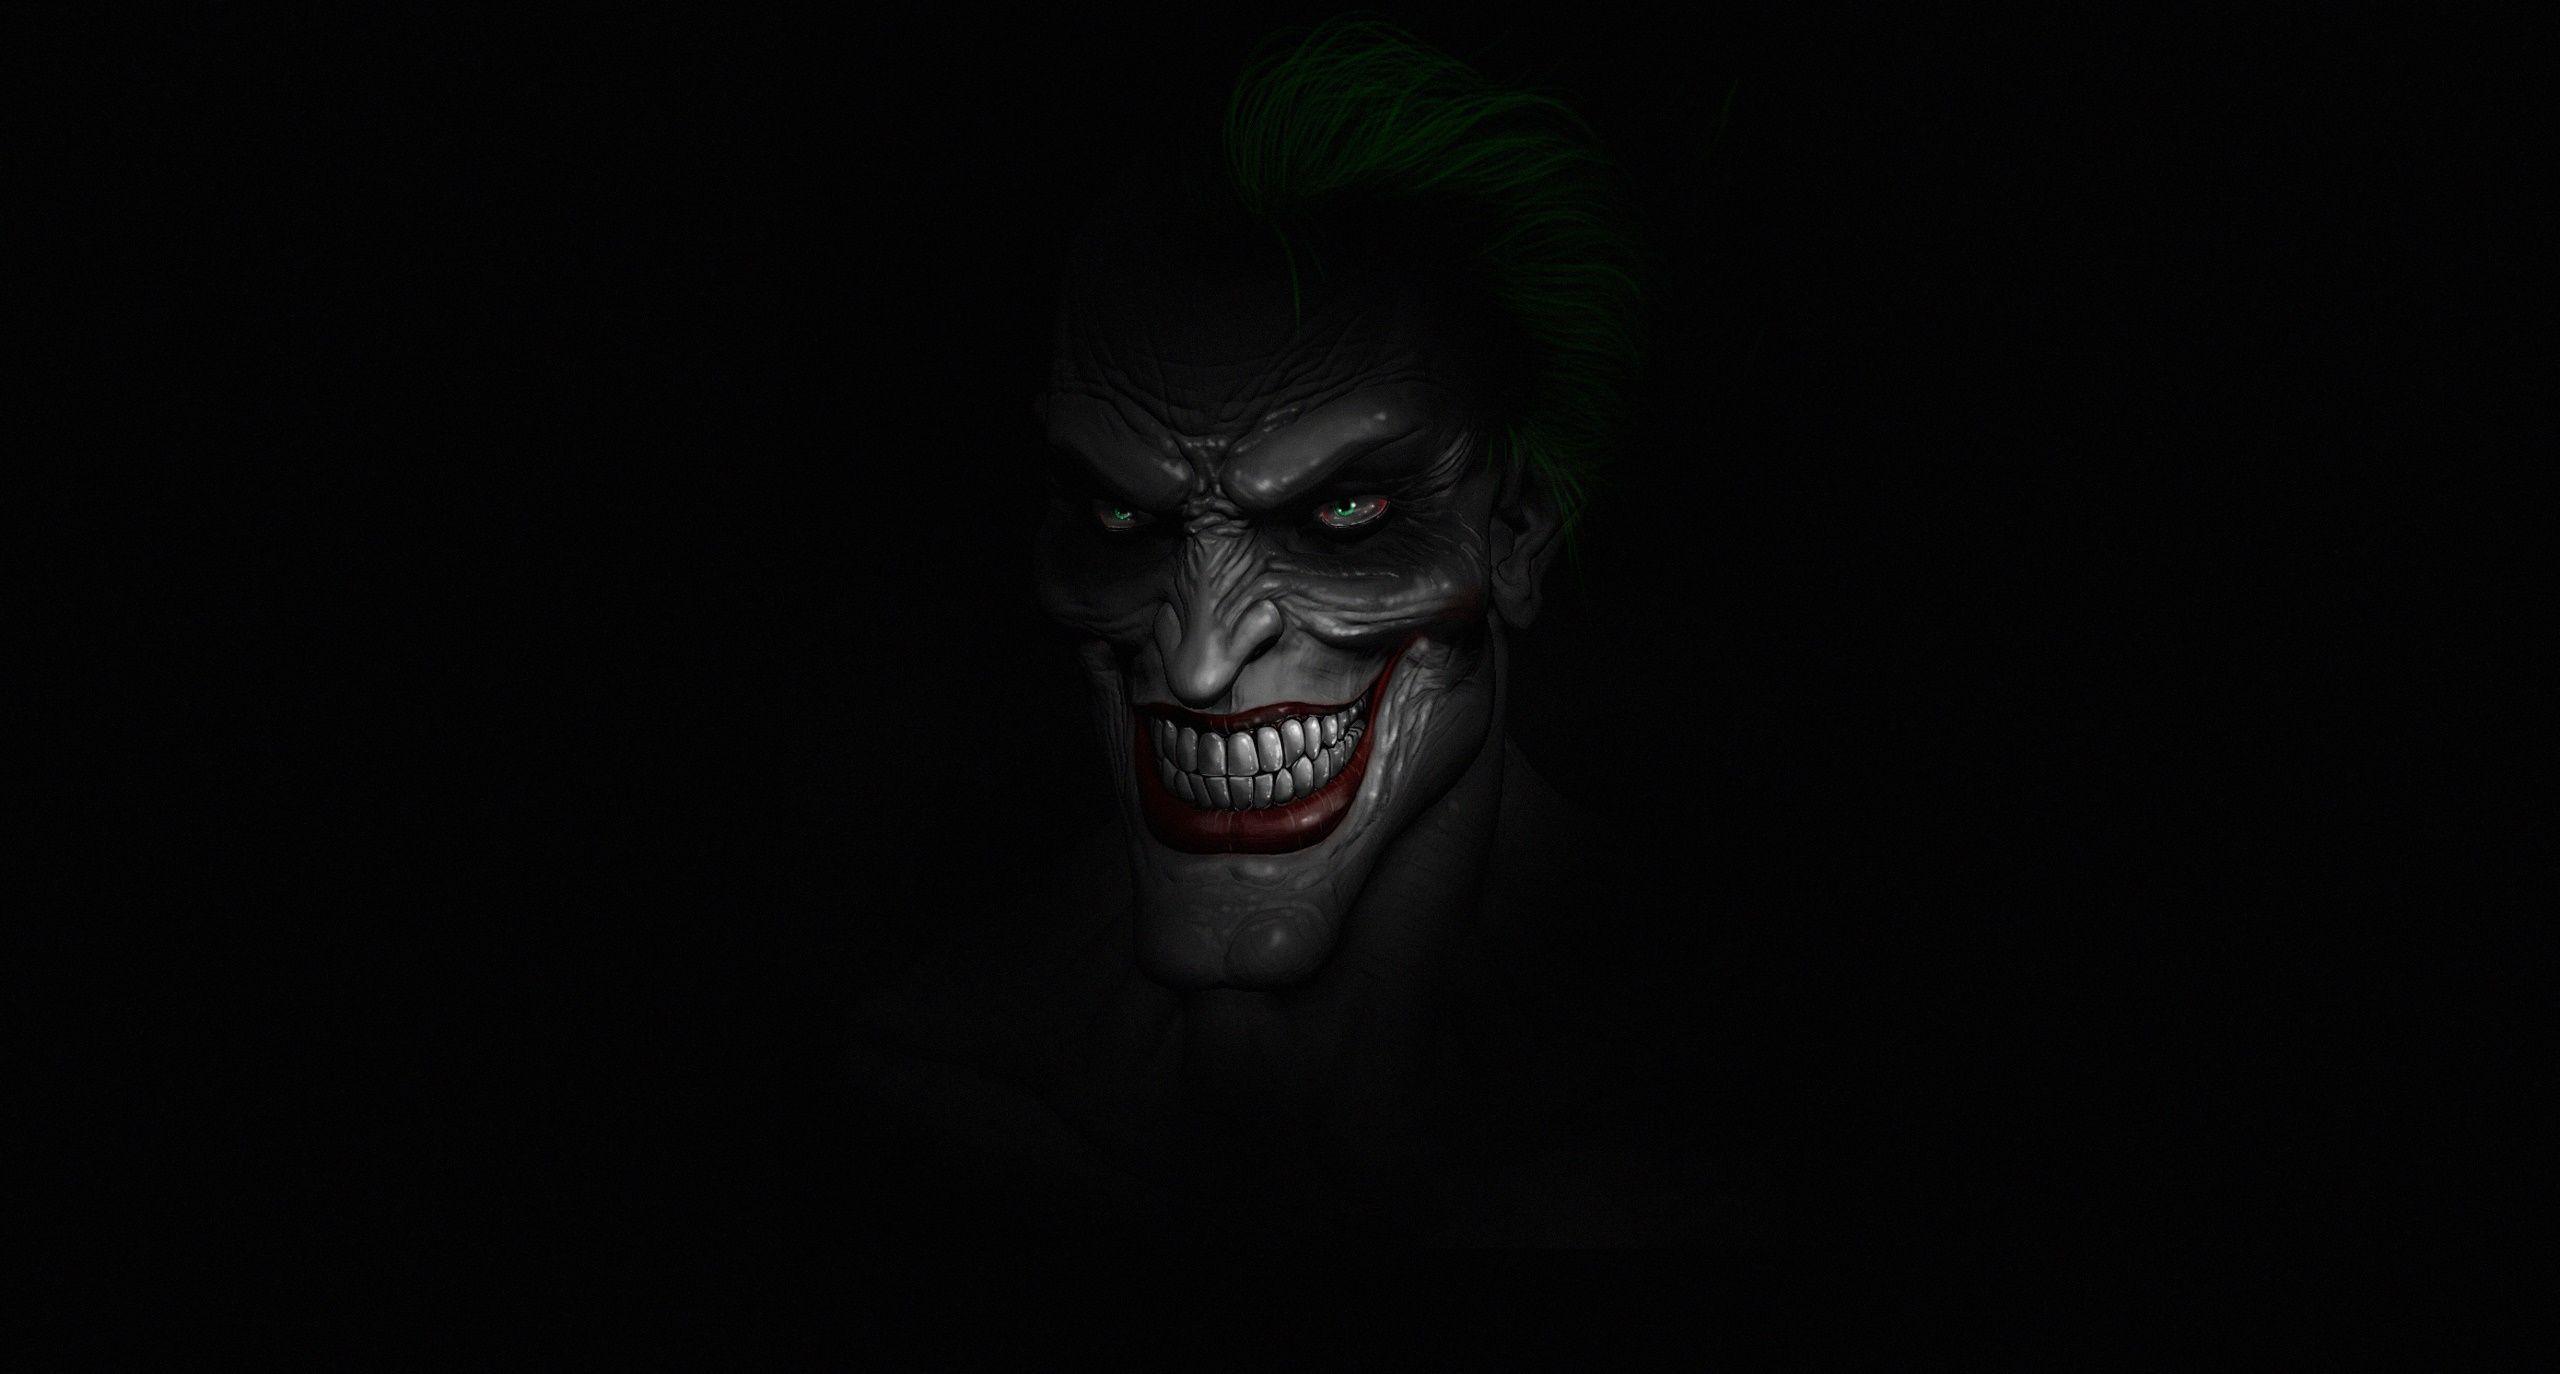 Joker Black Wallpapers Top Free Joker Black Backgrounds Wallpaperaccess